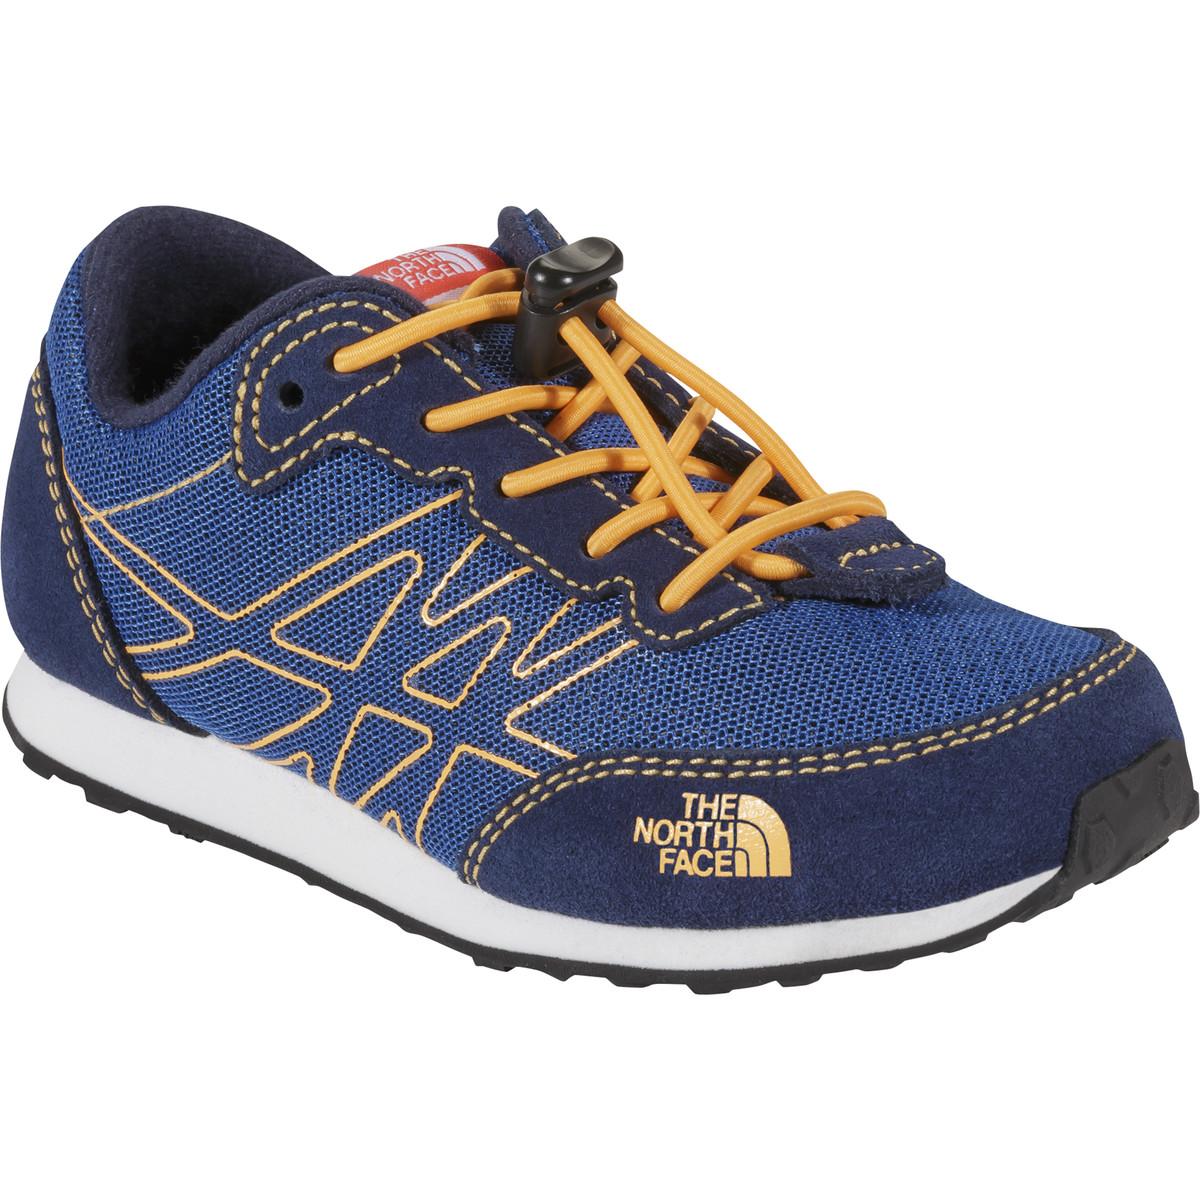 The North Face Kilowatt Shoe